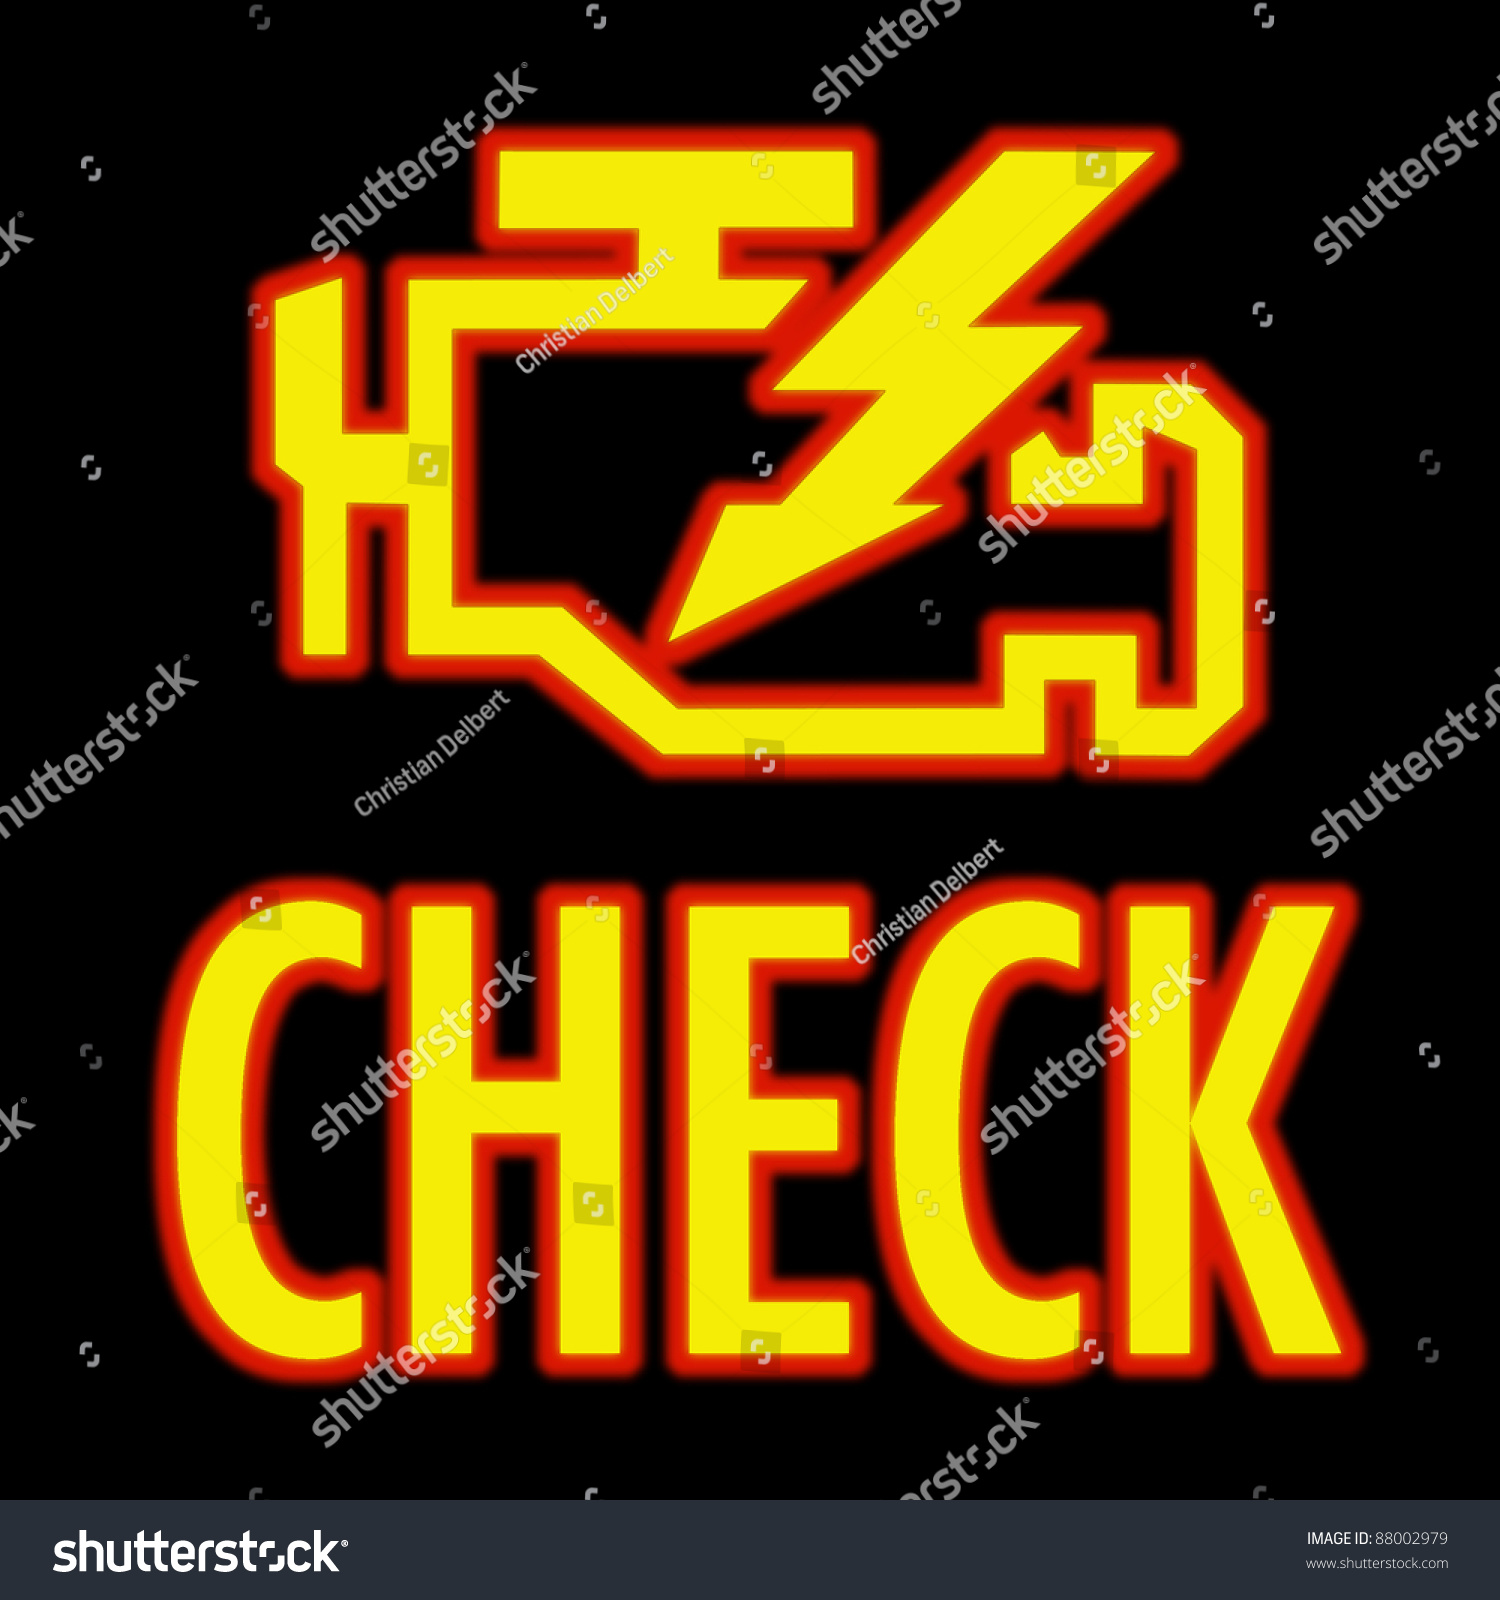 Check Engine Light Symbol That Pops Stock Photo 88002979